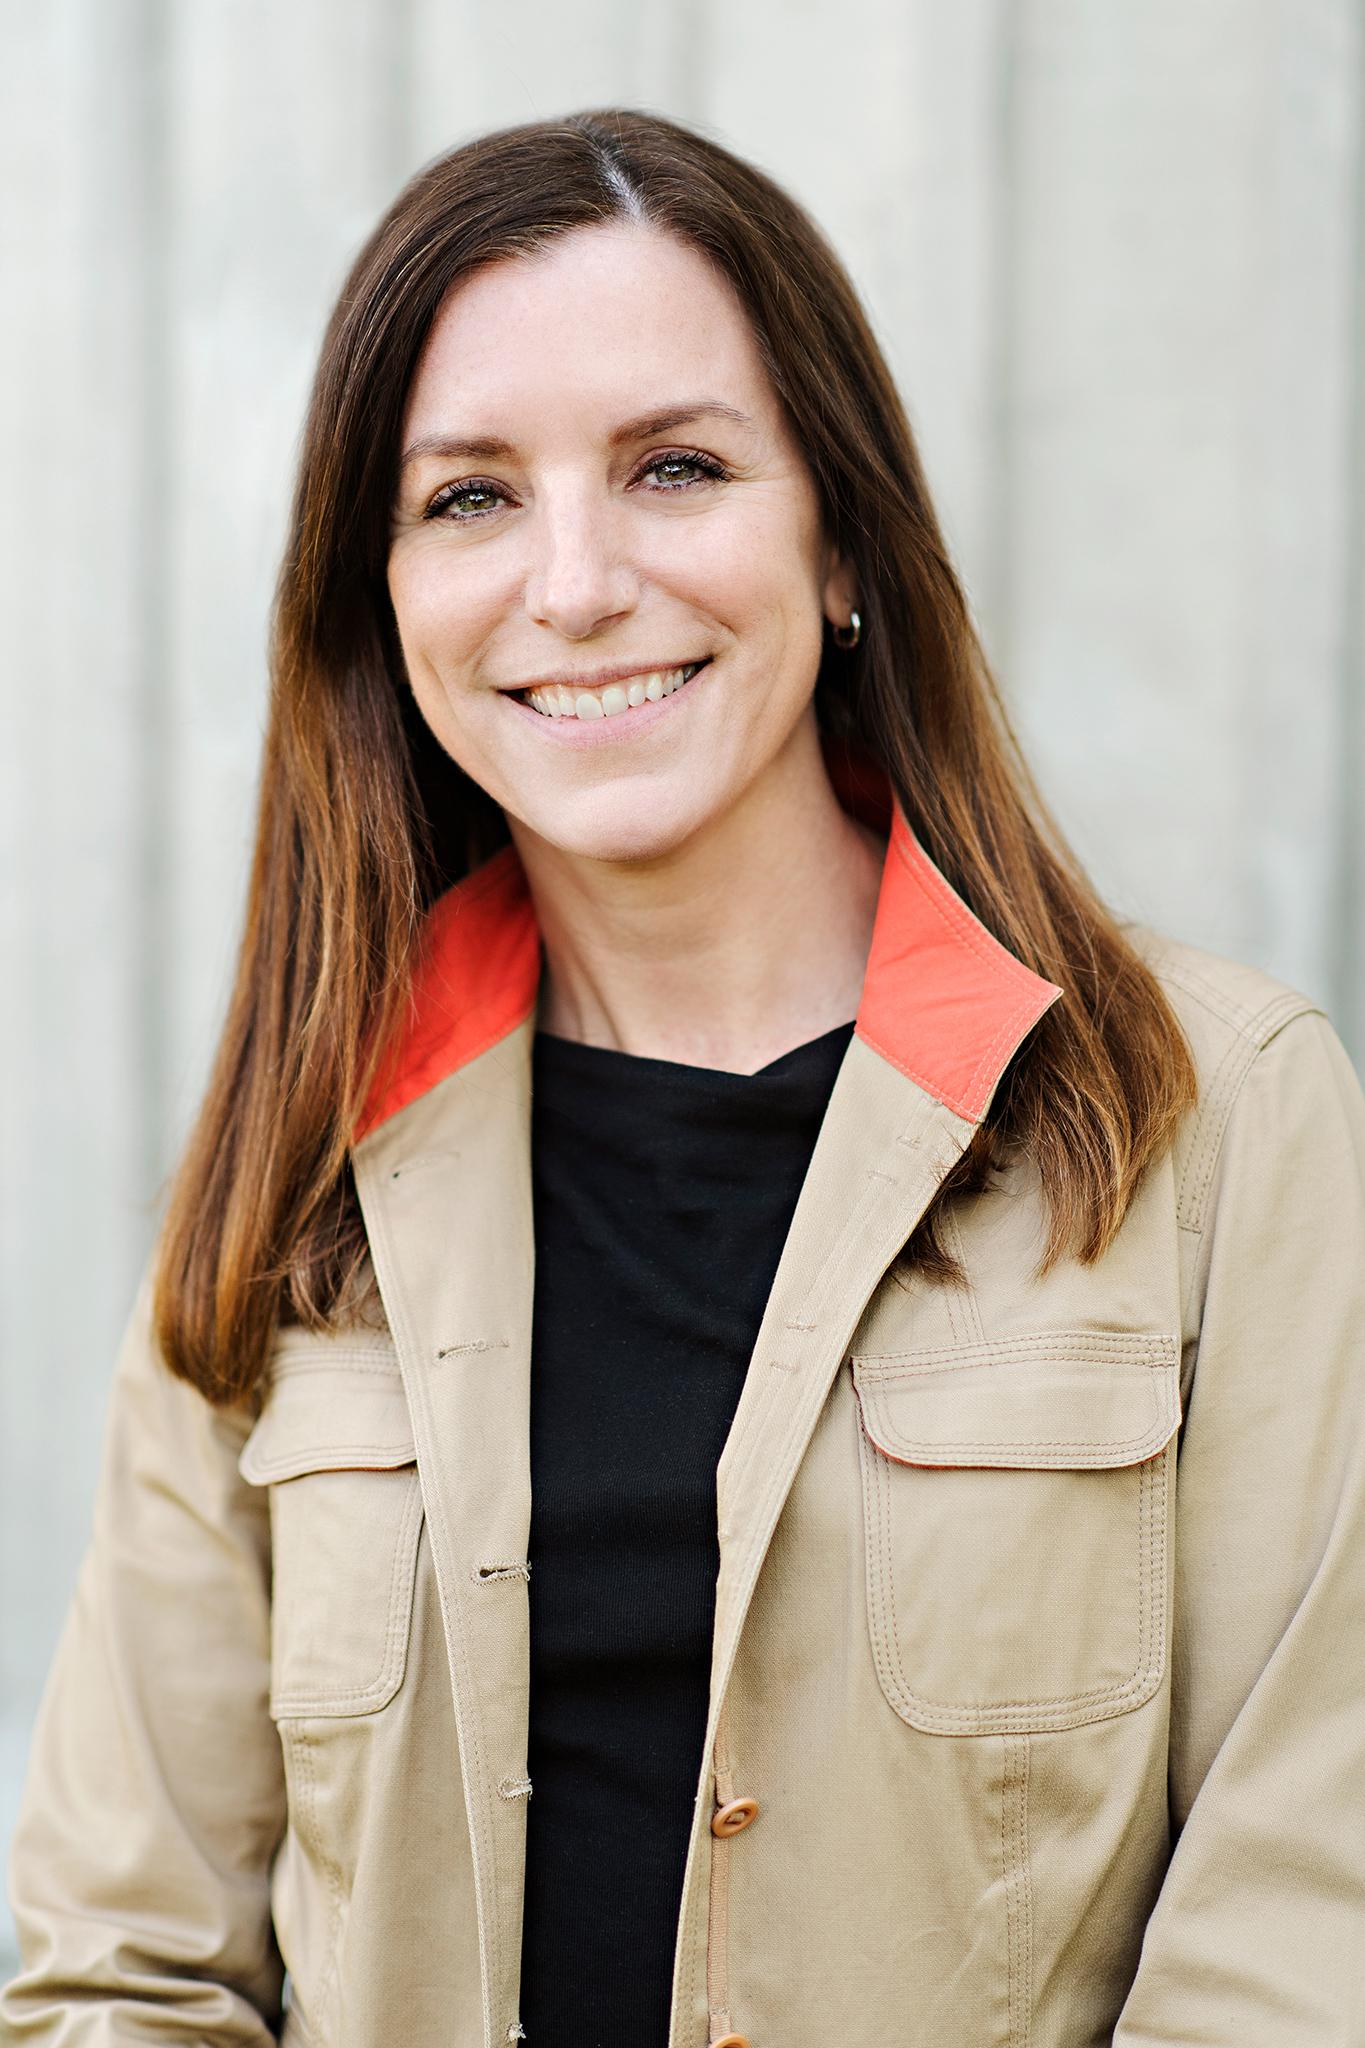 Kathy Bazinet